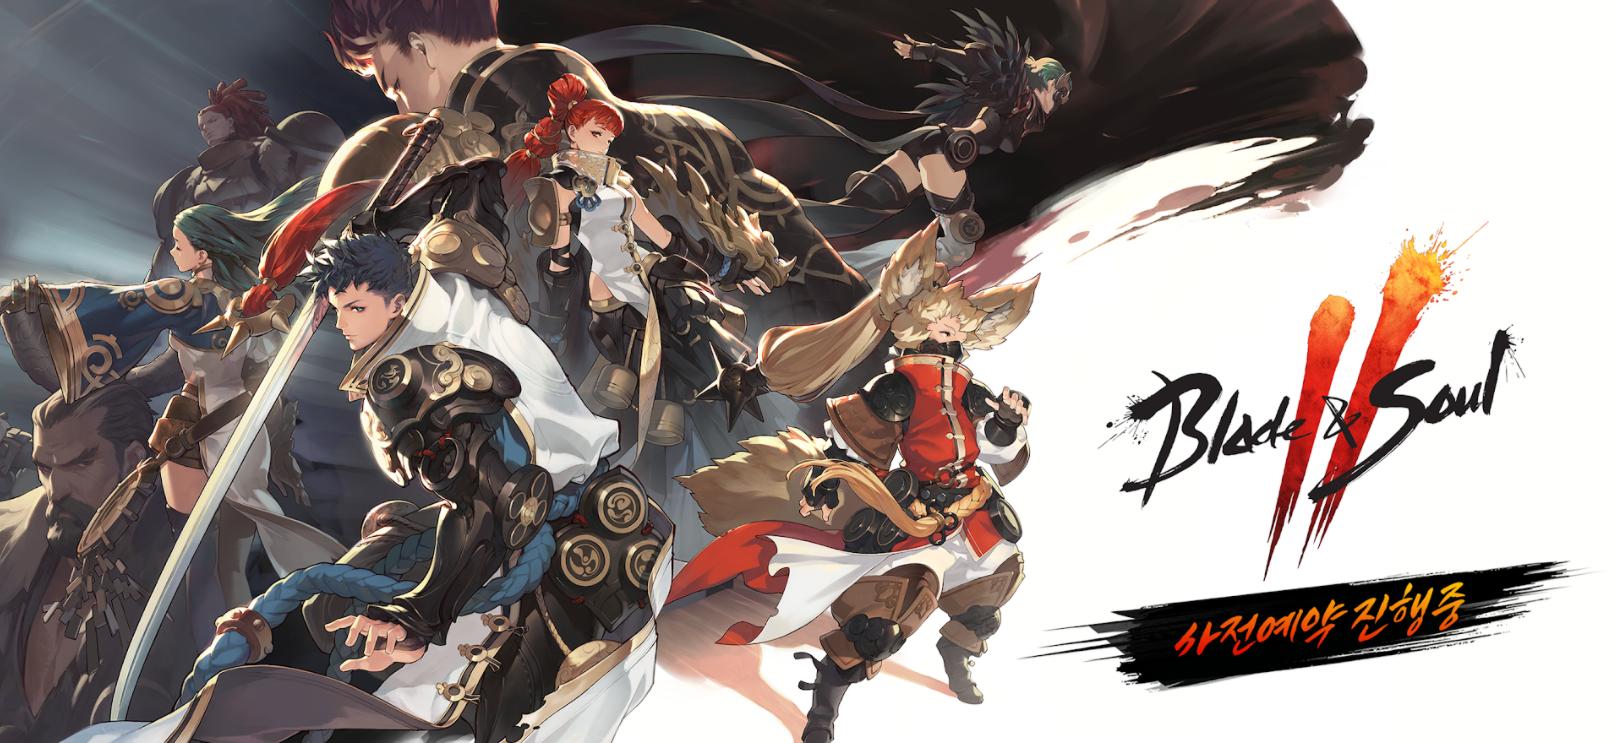 Capture d'écran Blade and Soul 2 Android